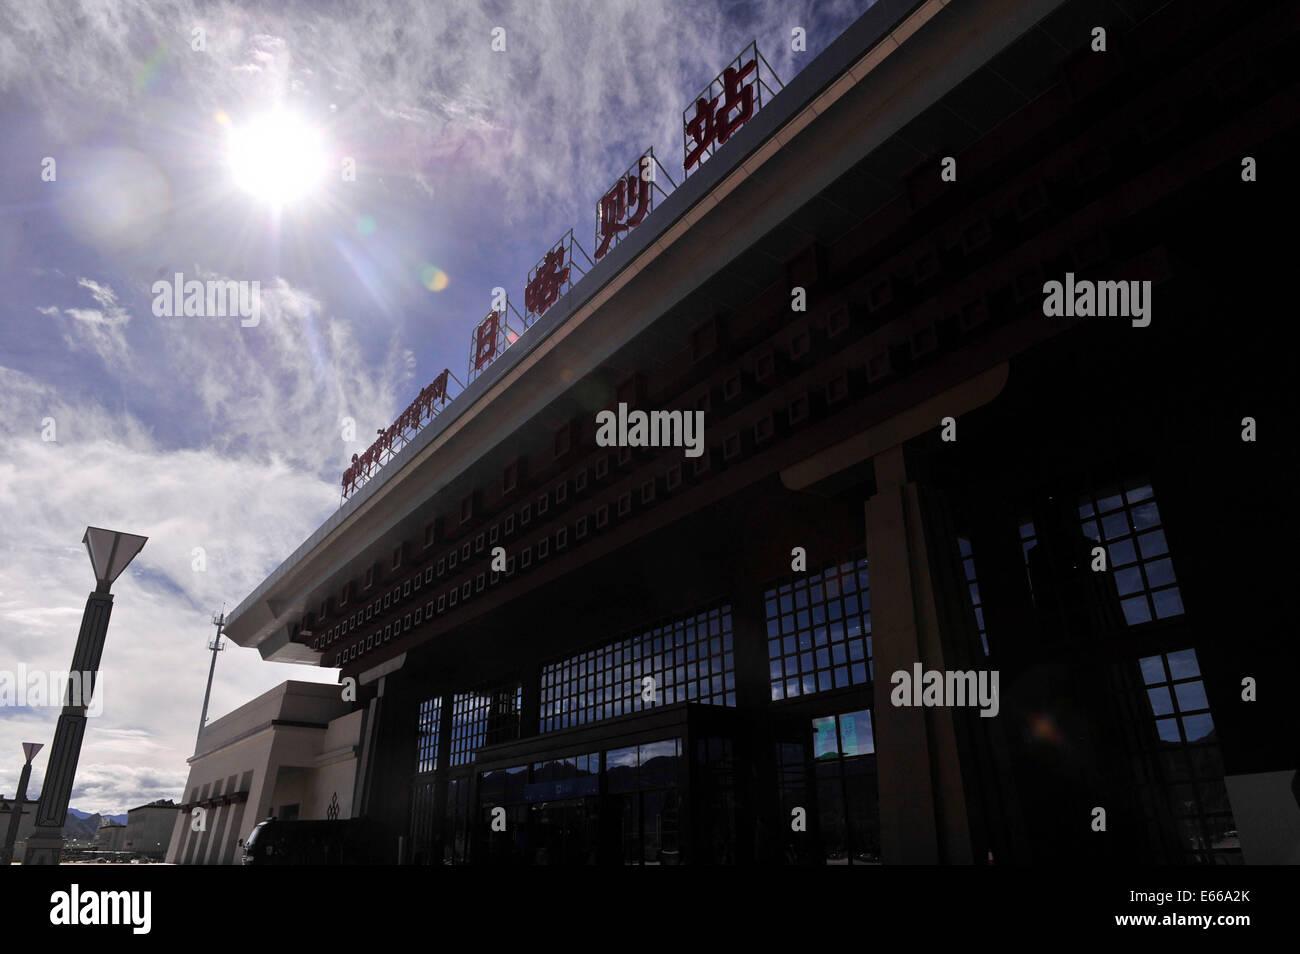 Xigaze. 16th Aug, 2014. Photo taken on Aug. 16, 2014 shows the Xigaze Railway Station in Xigaze, southwest China's - Stock Image